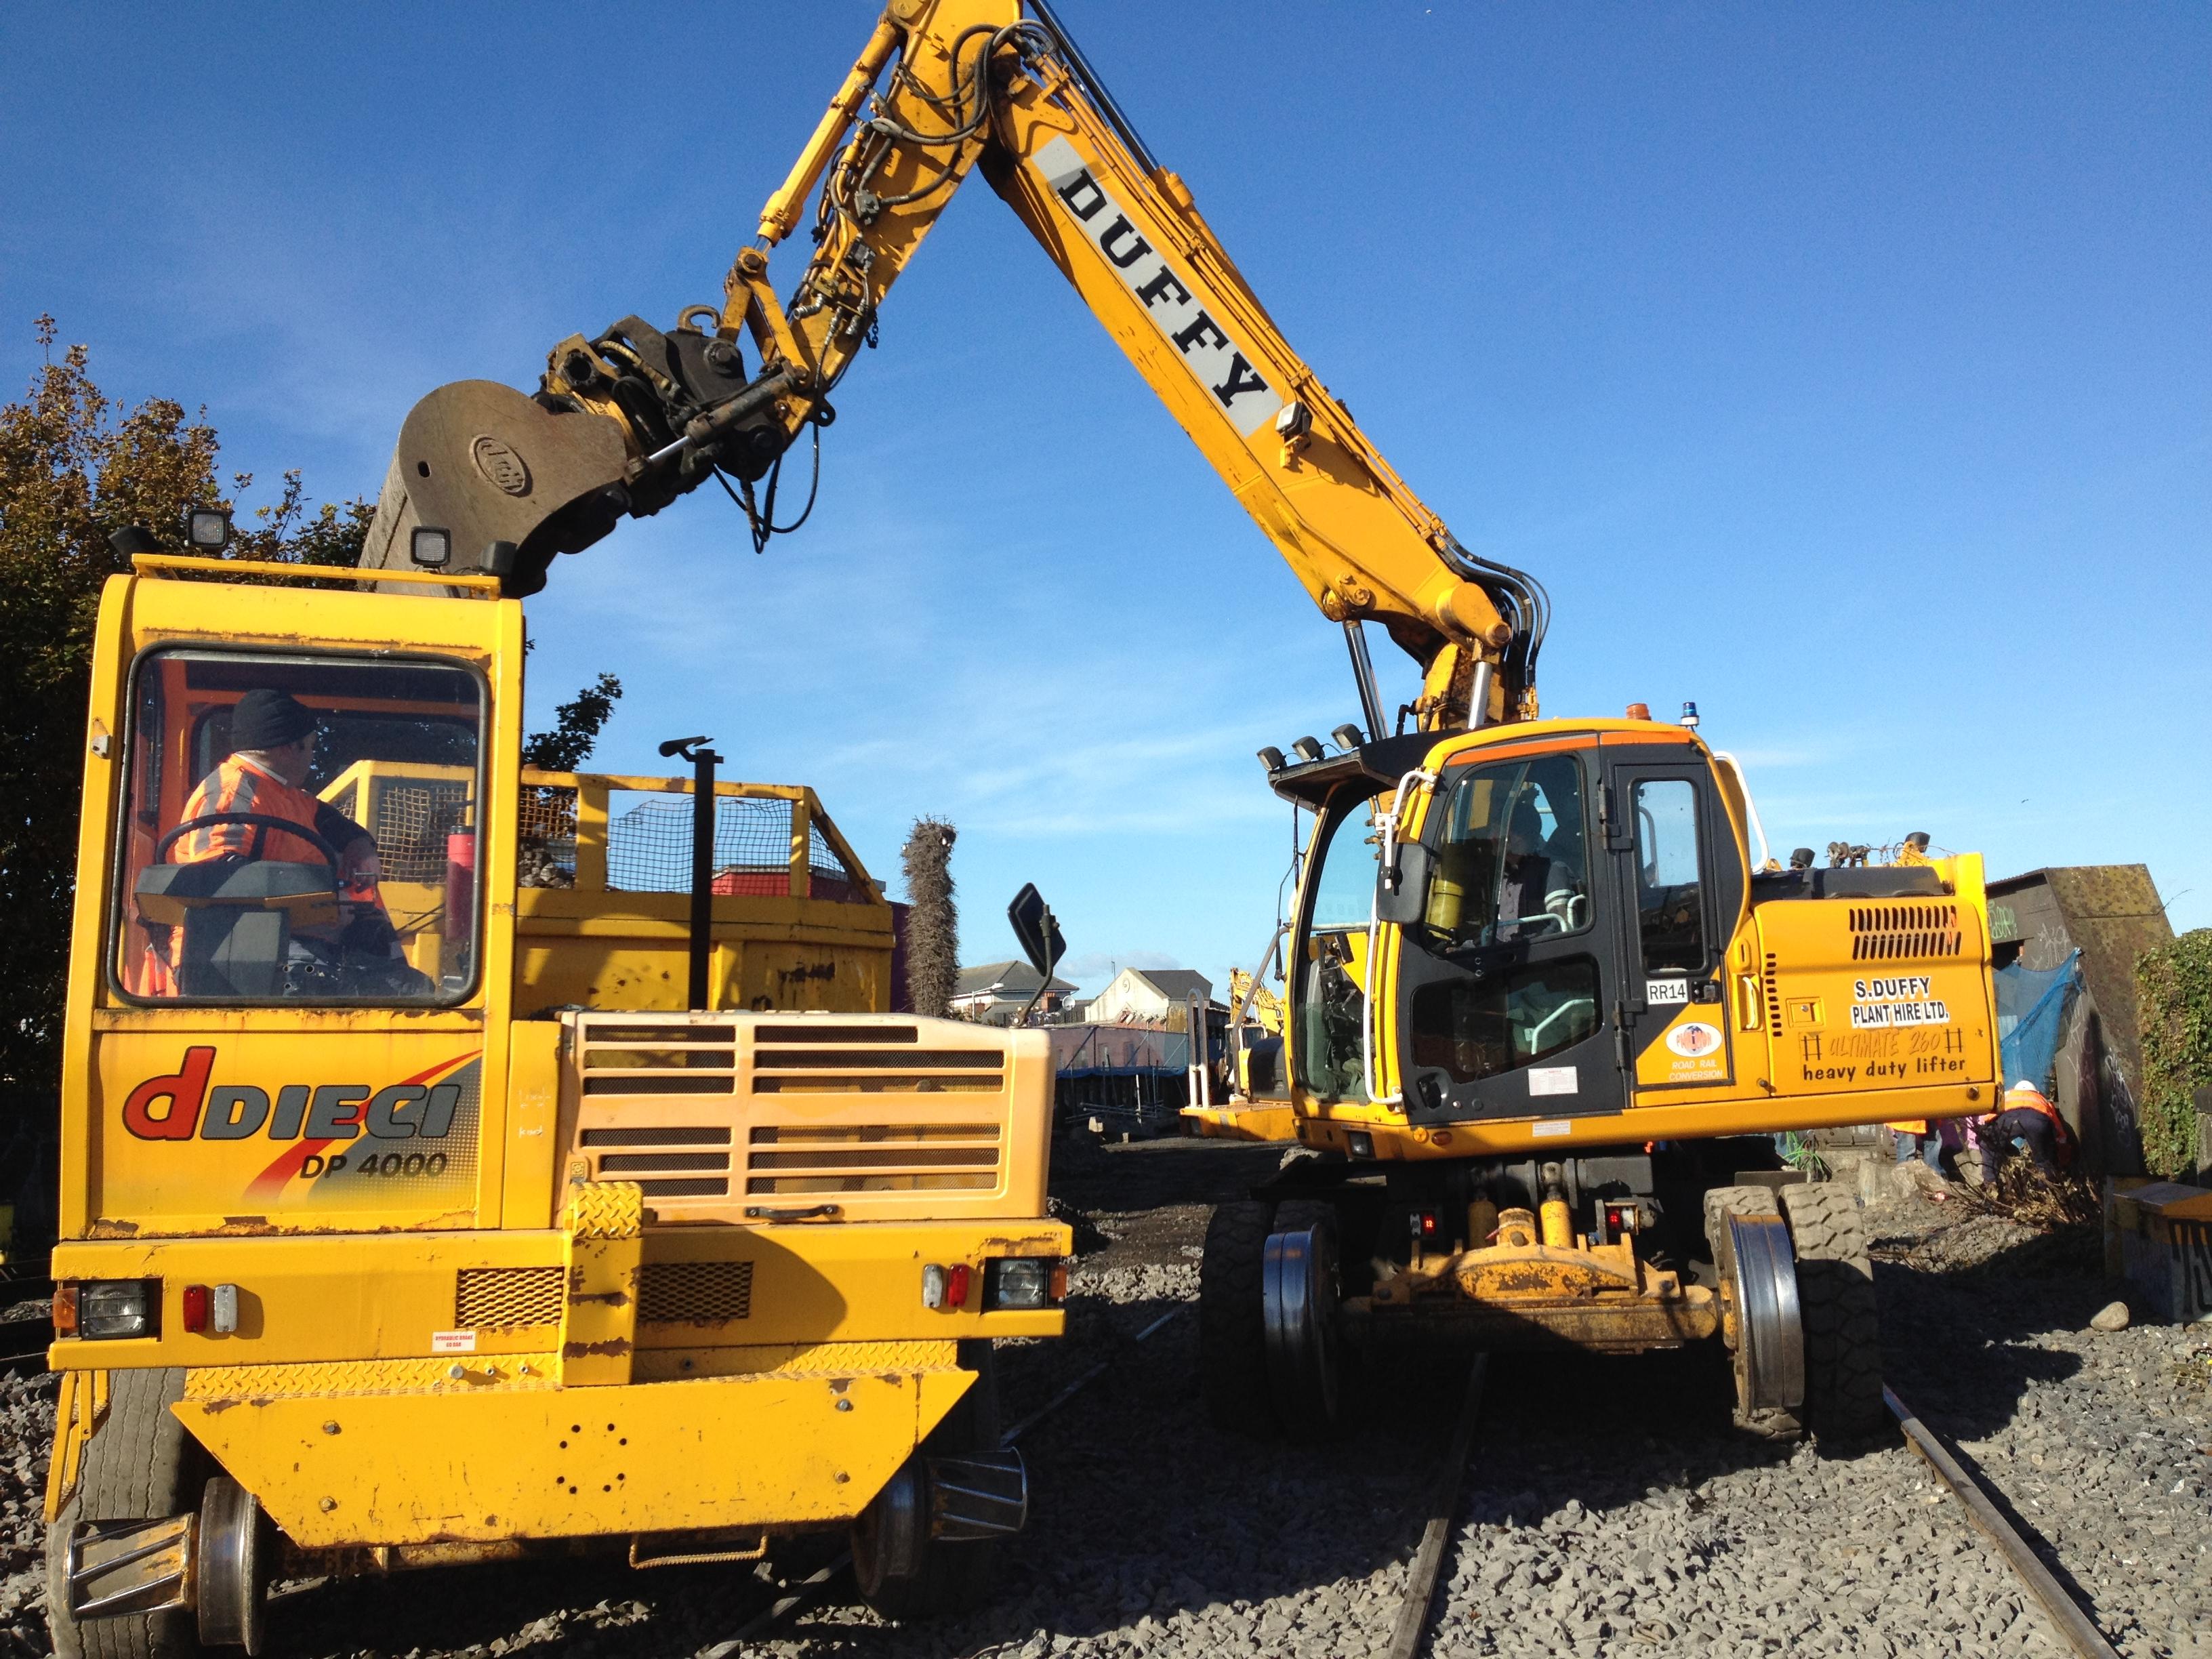 S Duffy Plant Hire Deici Rail Road Dumper